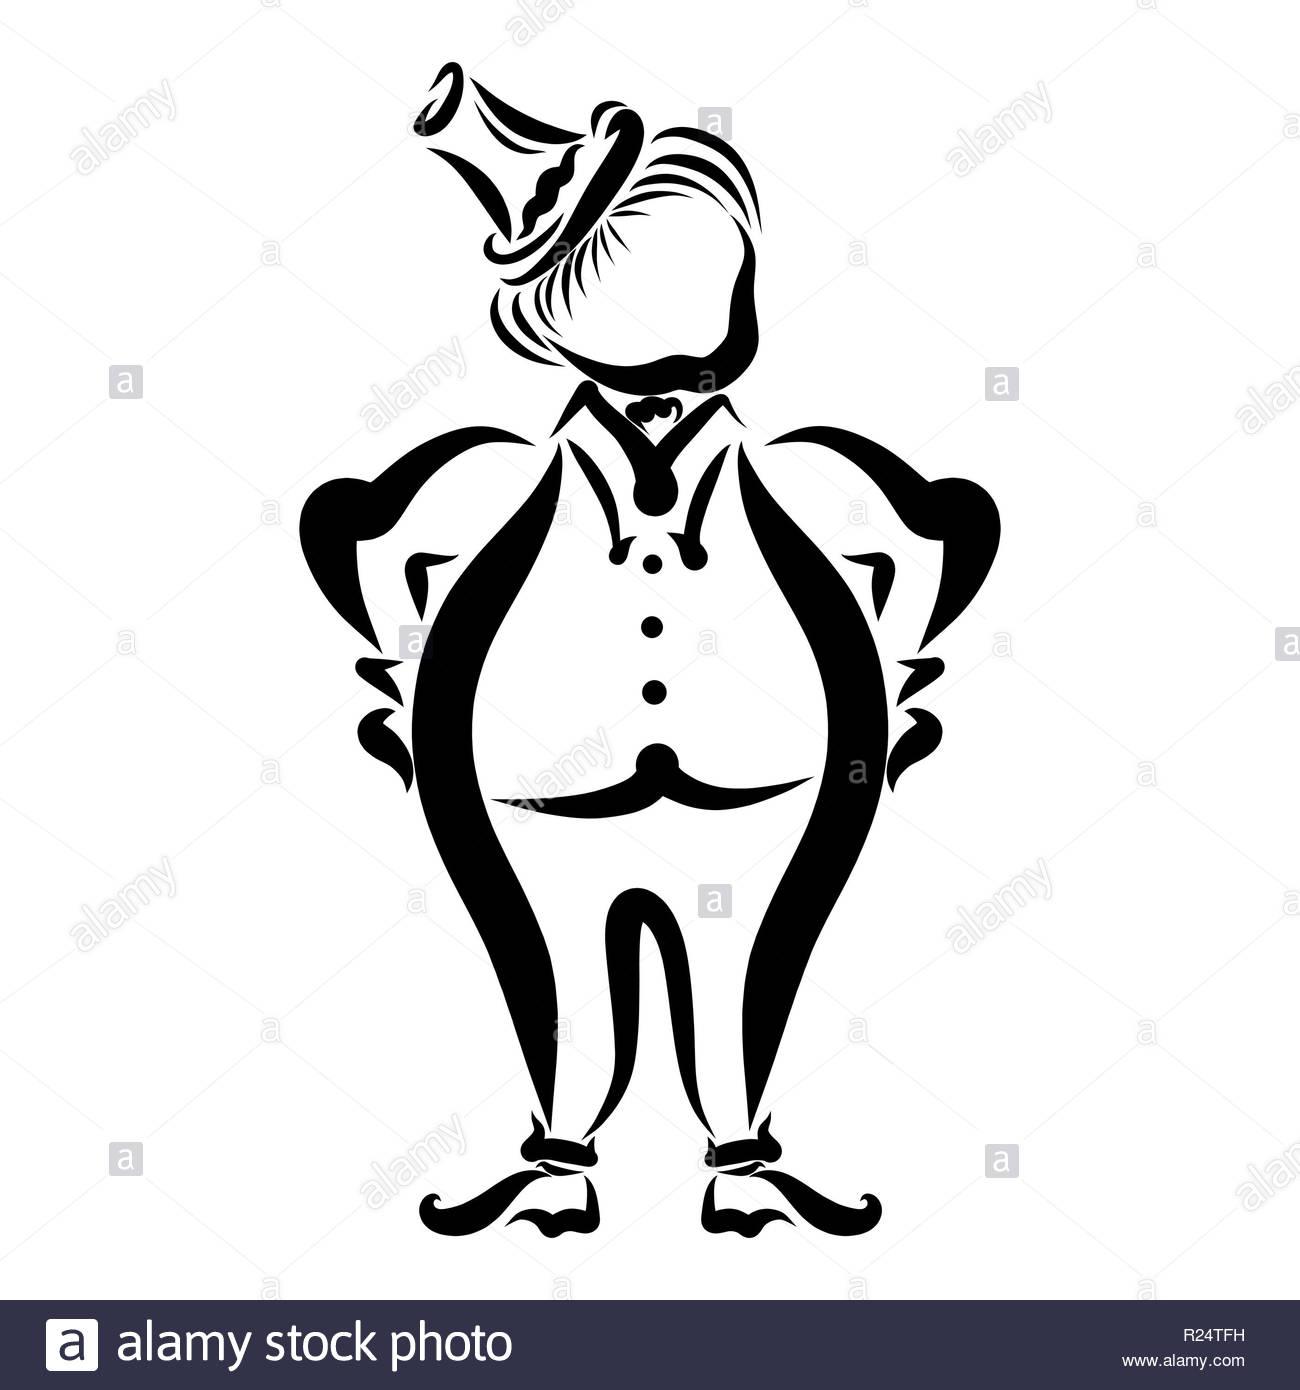 Fat Banker Immagini   Fat Banker Fotos Stock - Alamy f41f9cb5c193